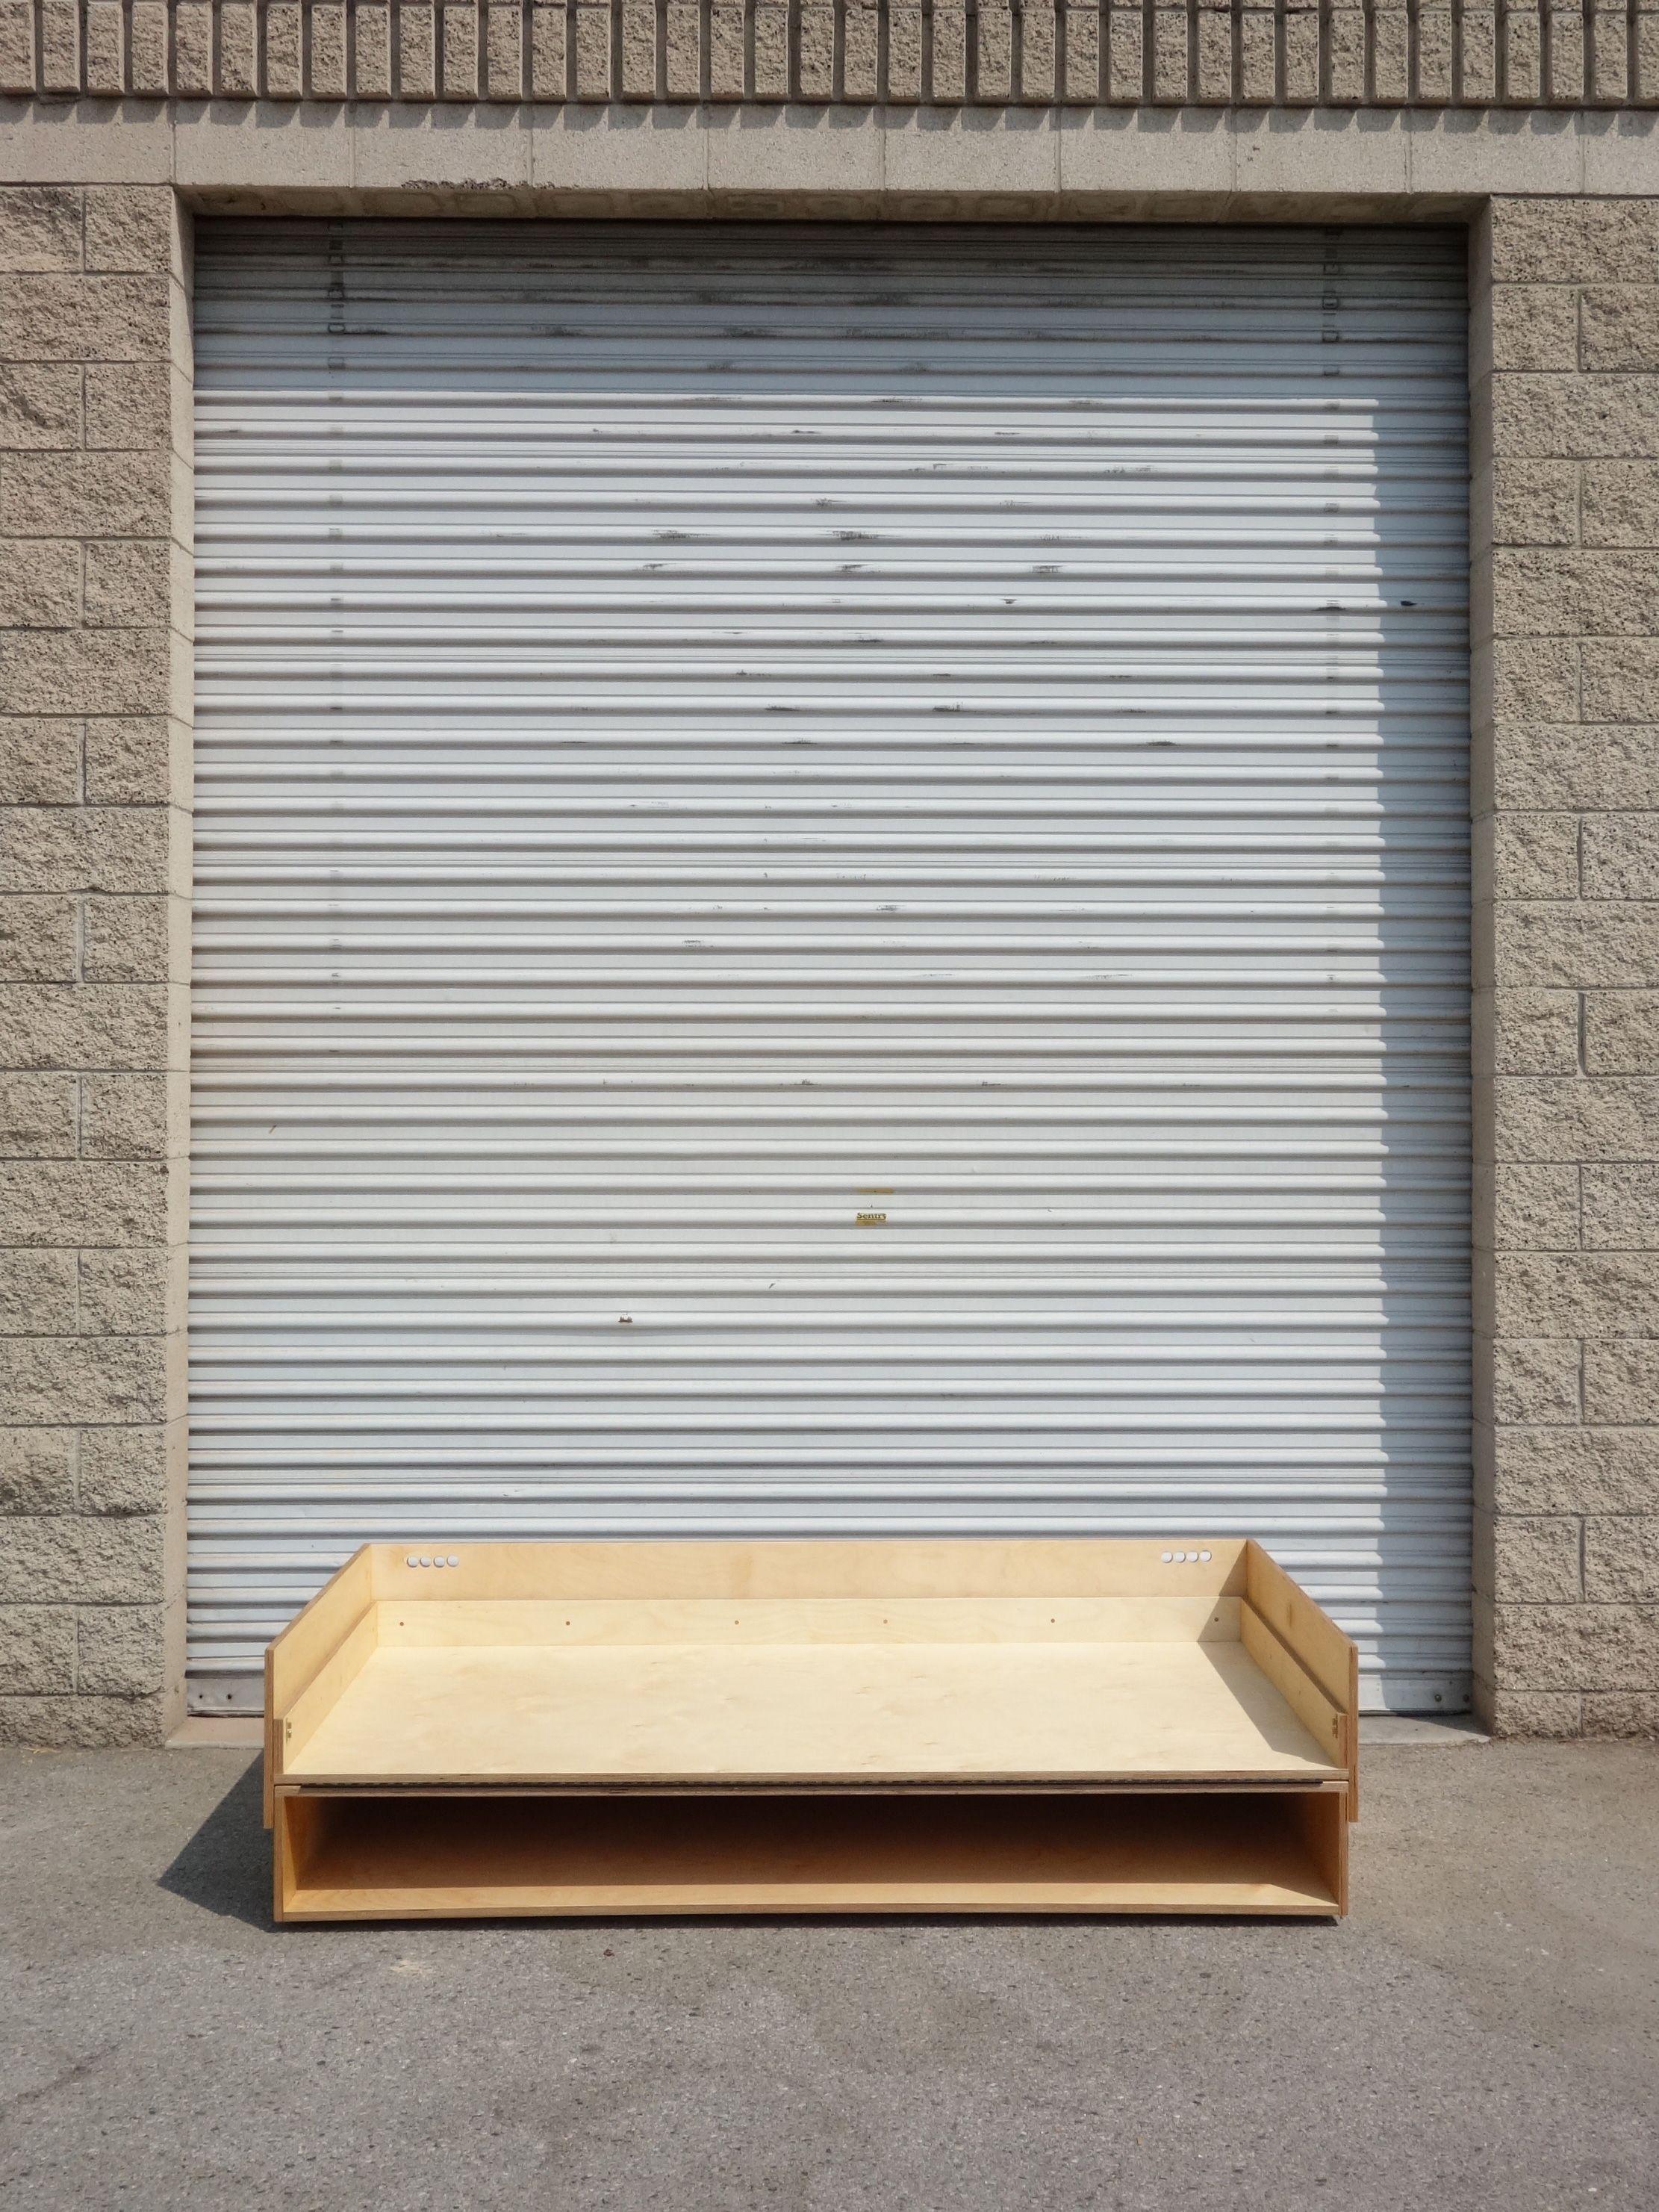 Folding Bed product image 0